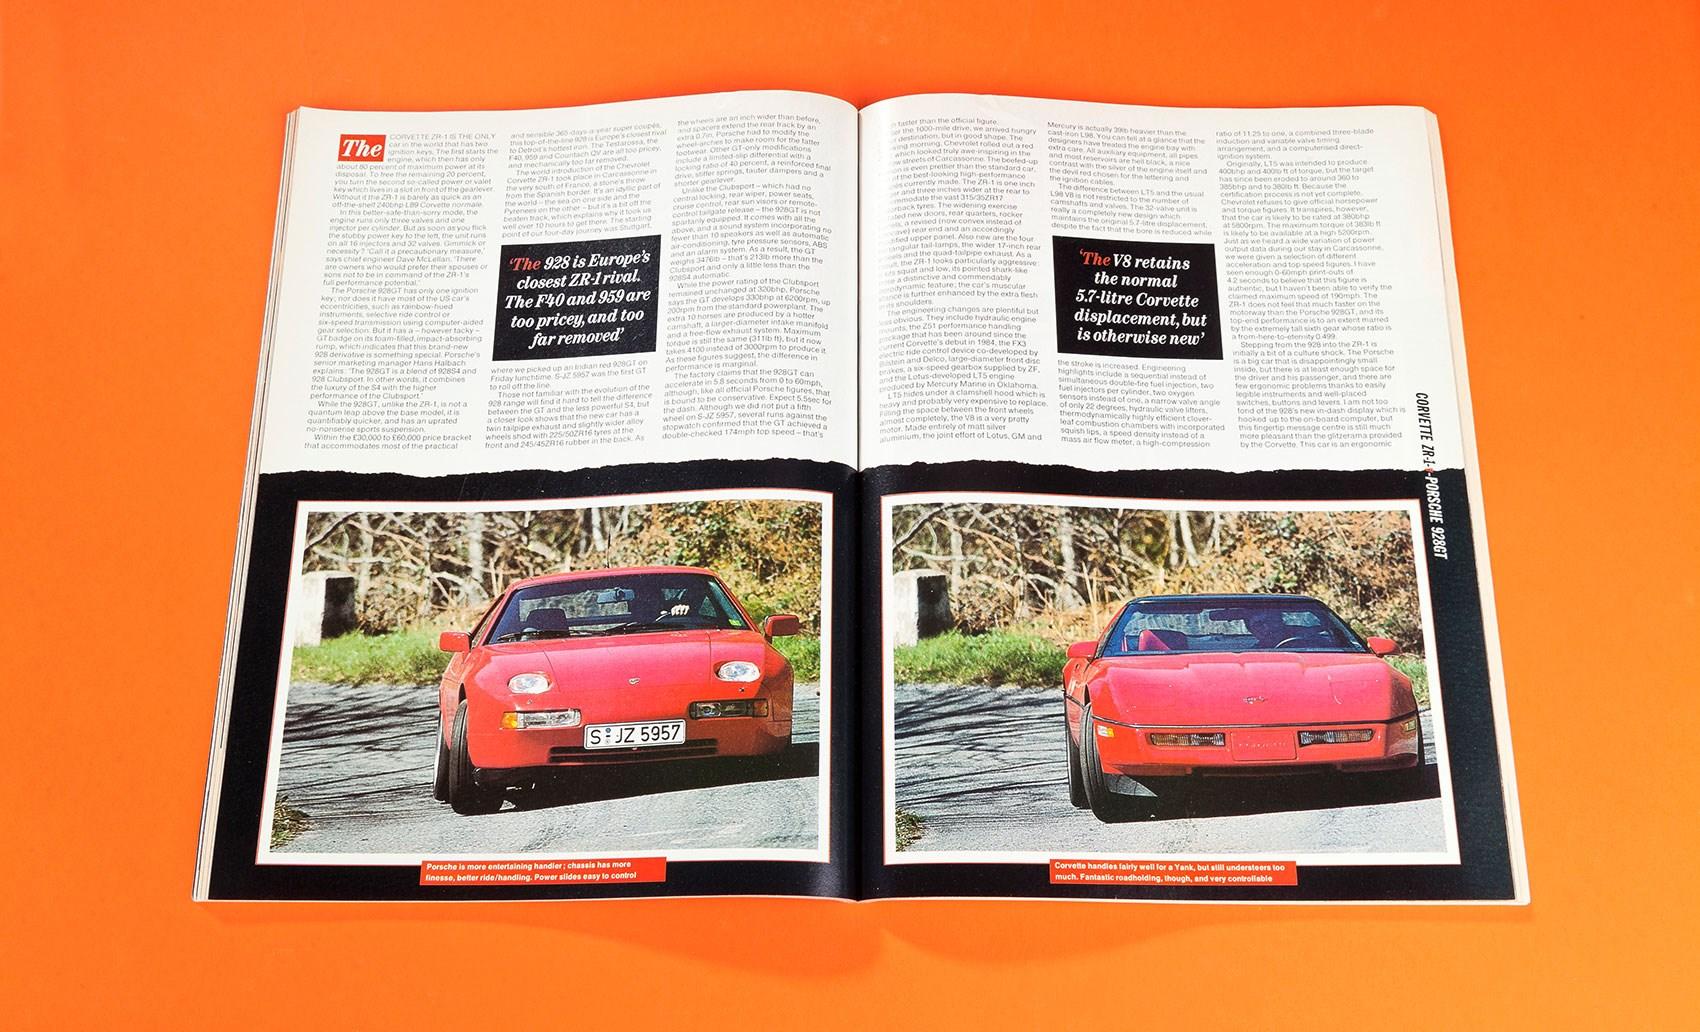 Closing the gap: Corvette ZR-1 vs Porsche 928GT (CAR achive, 1989